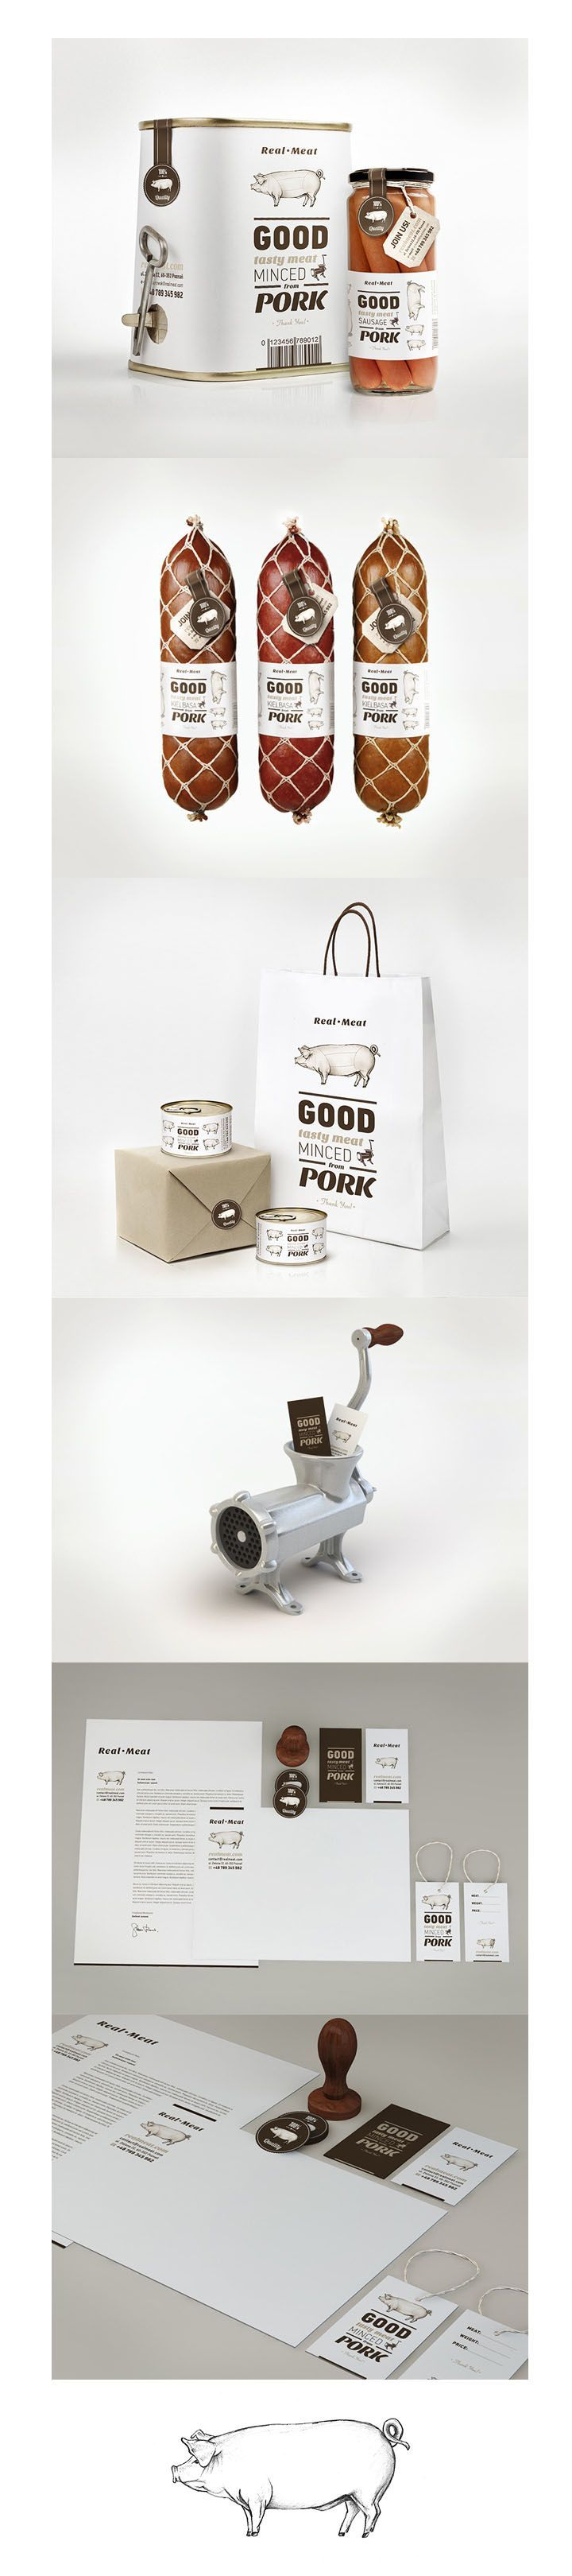 Real Meat #packaging #branding #design PD